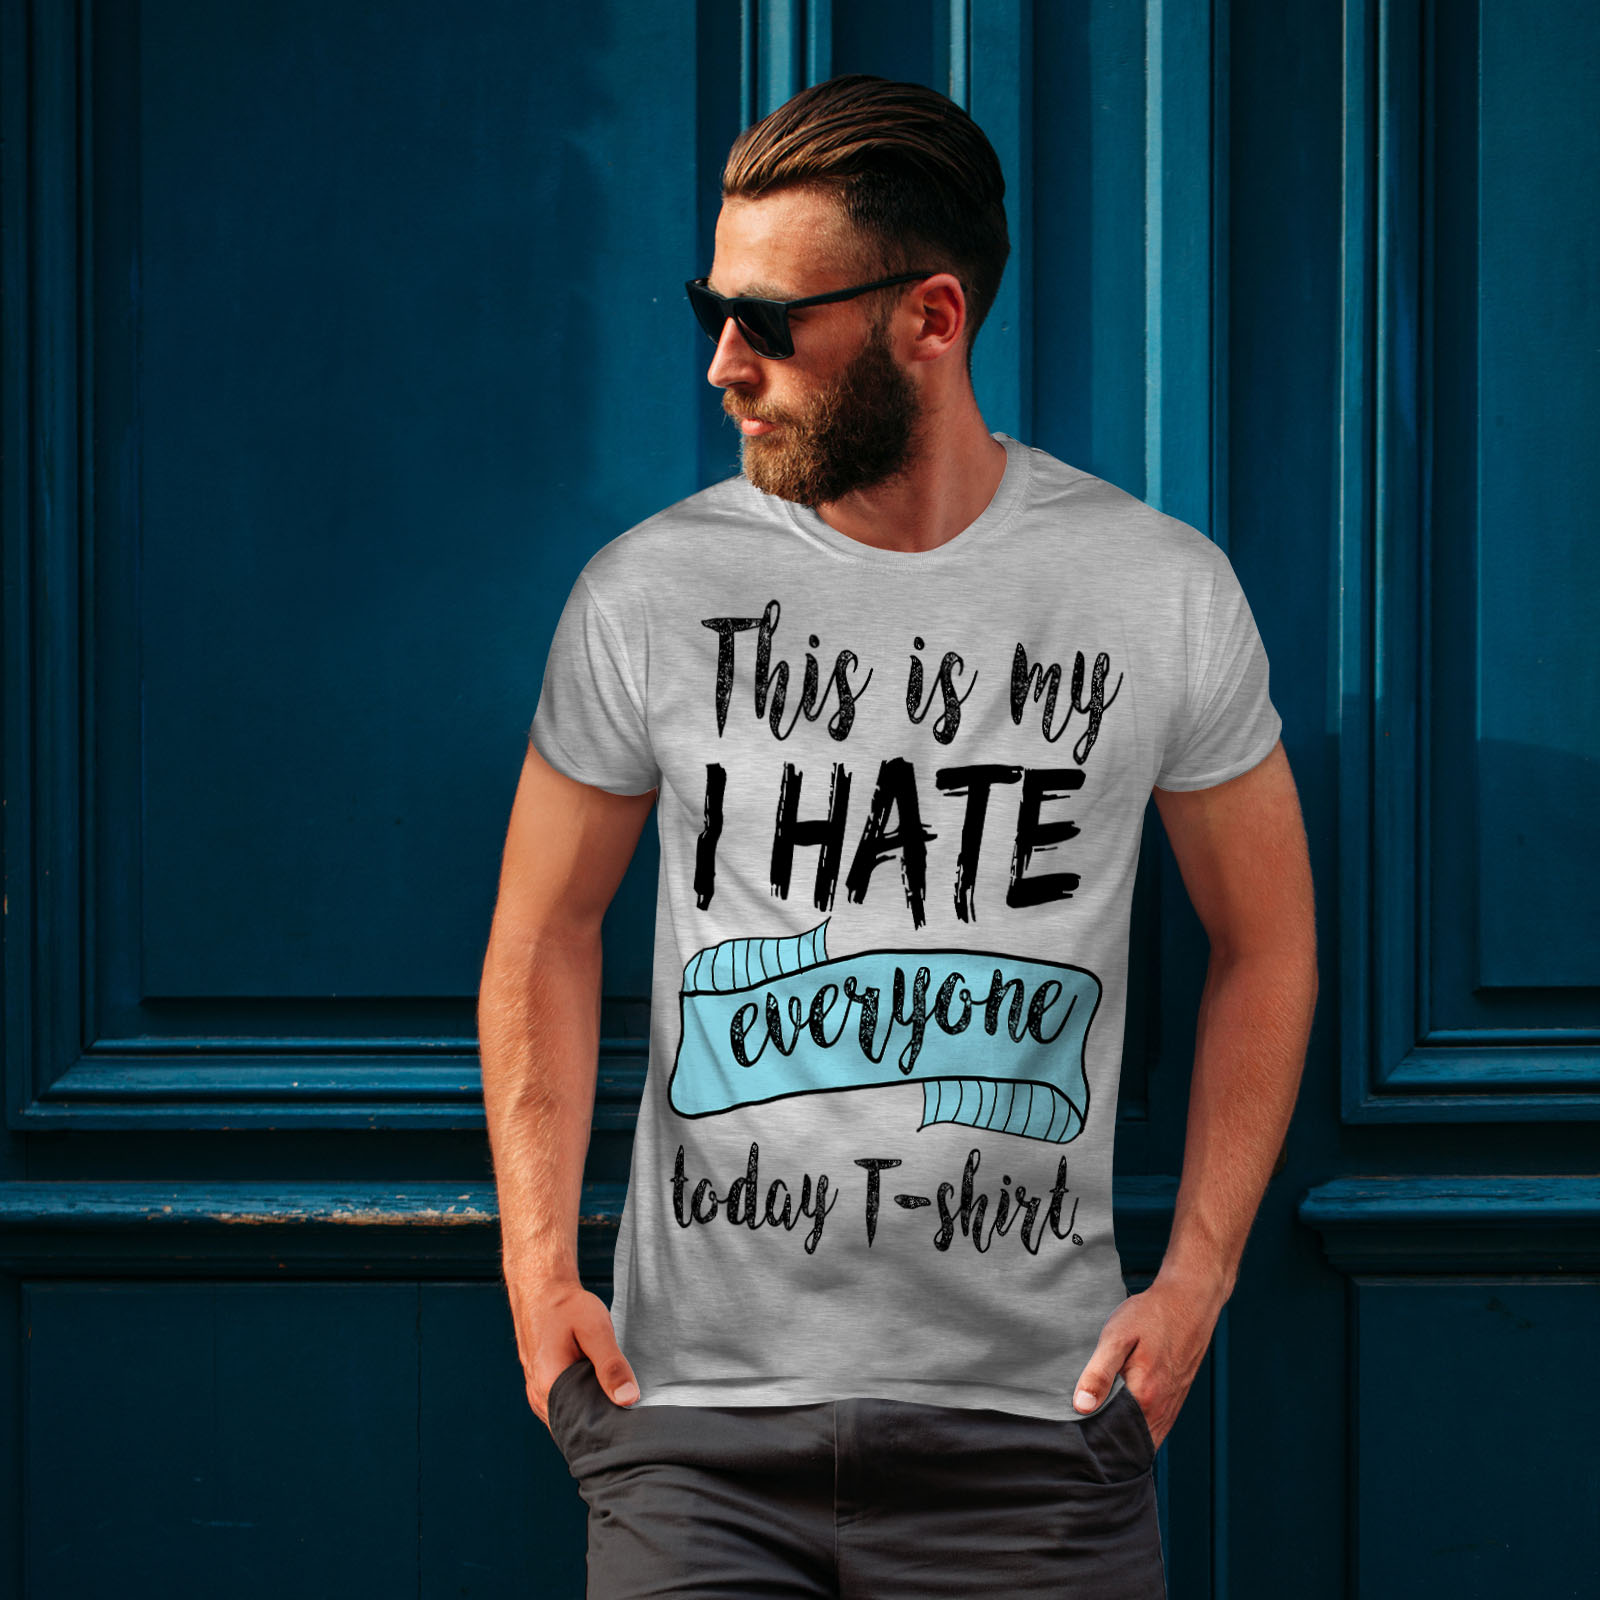 Wellcoda-hasse-alle-heute-Herren-T-Shirt-lustige-Grafikdesign-Printed-Tee Indexbild 16